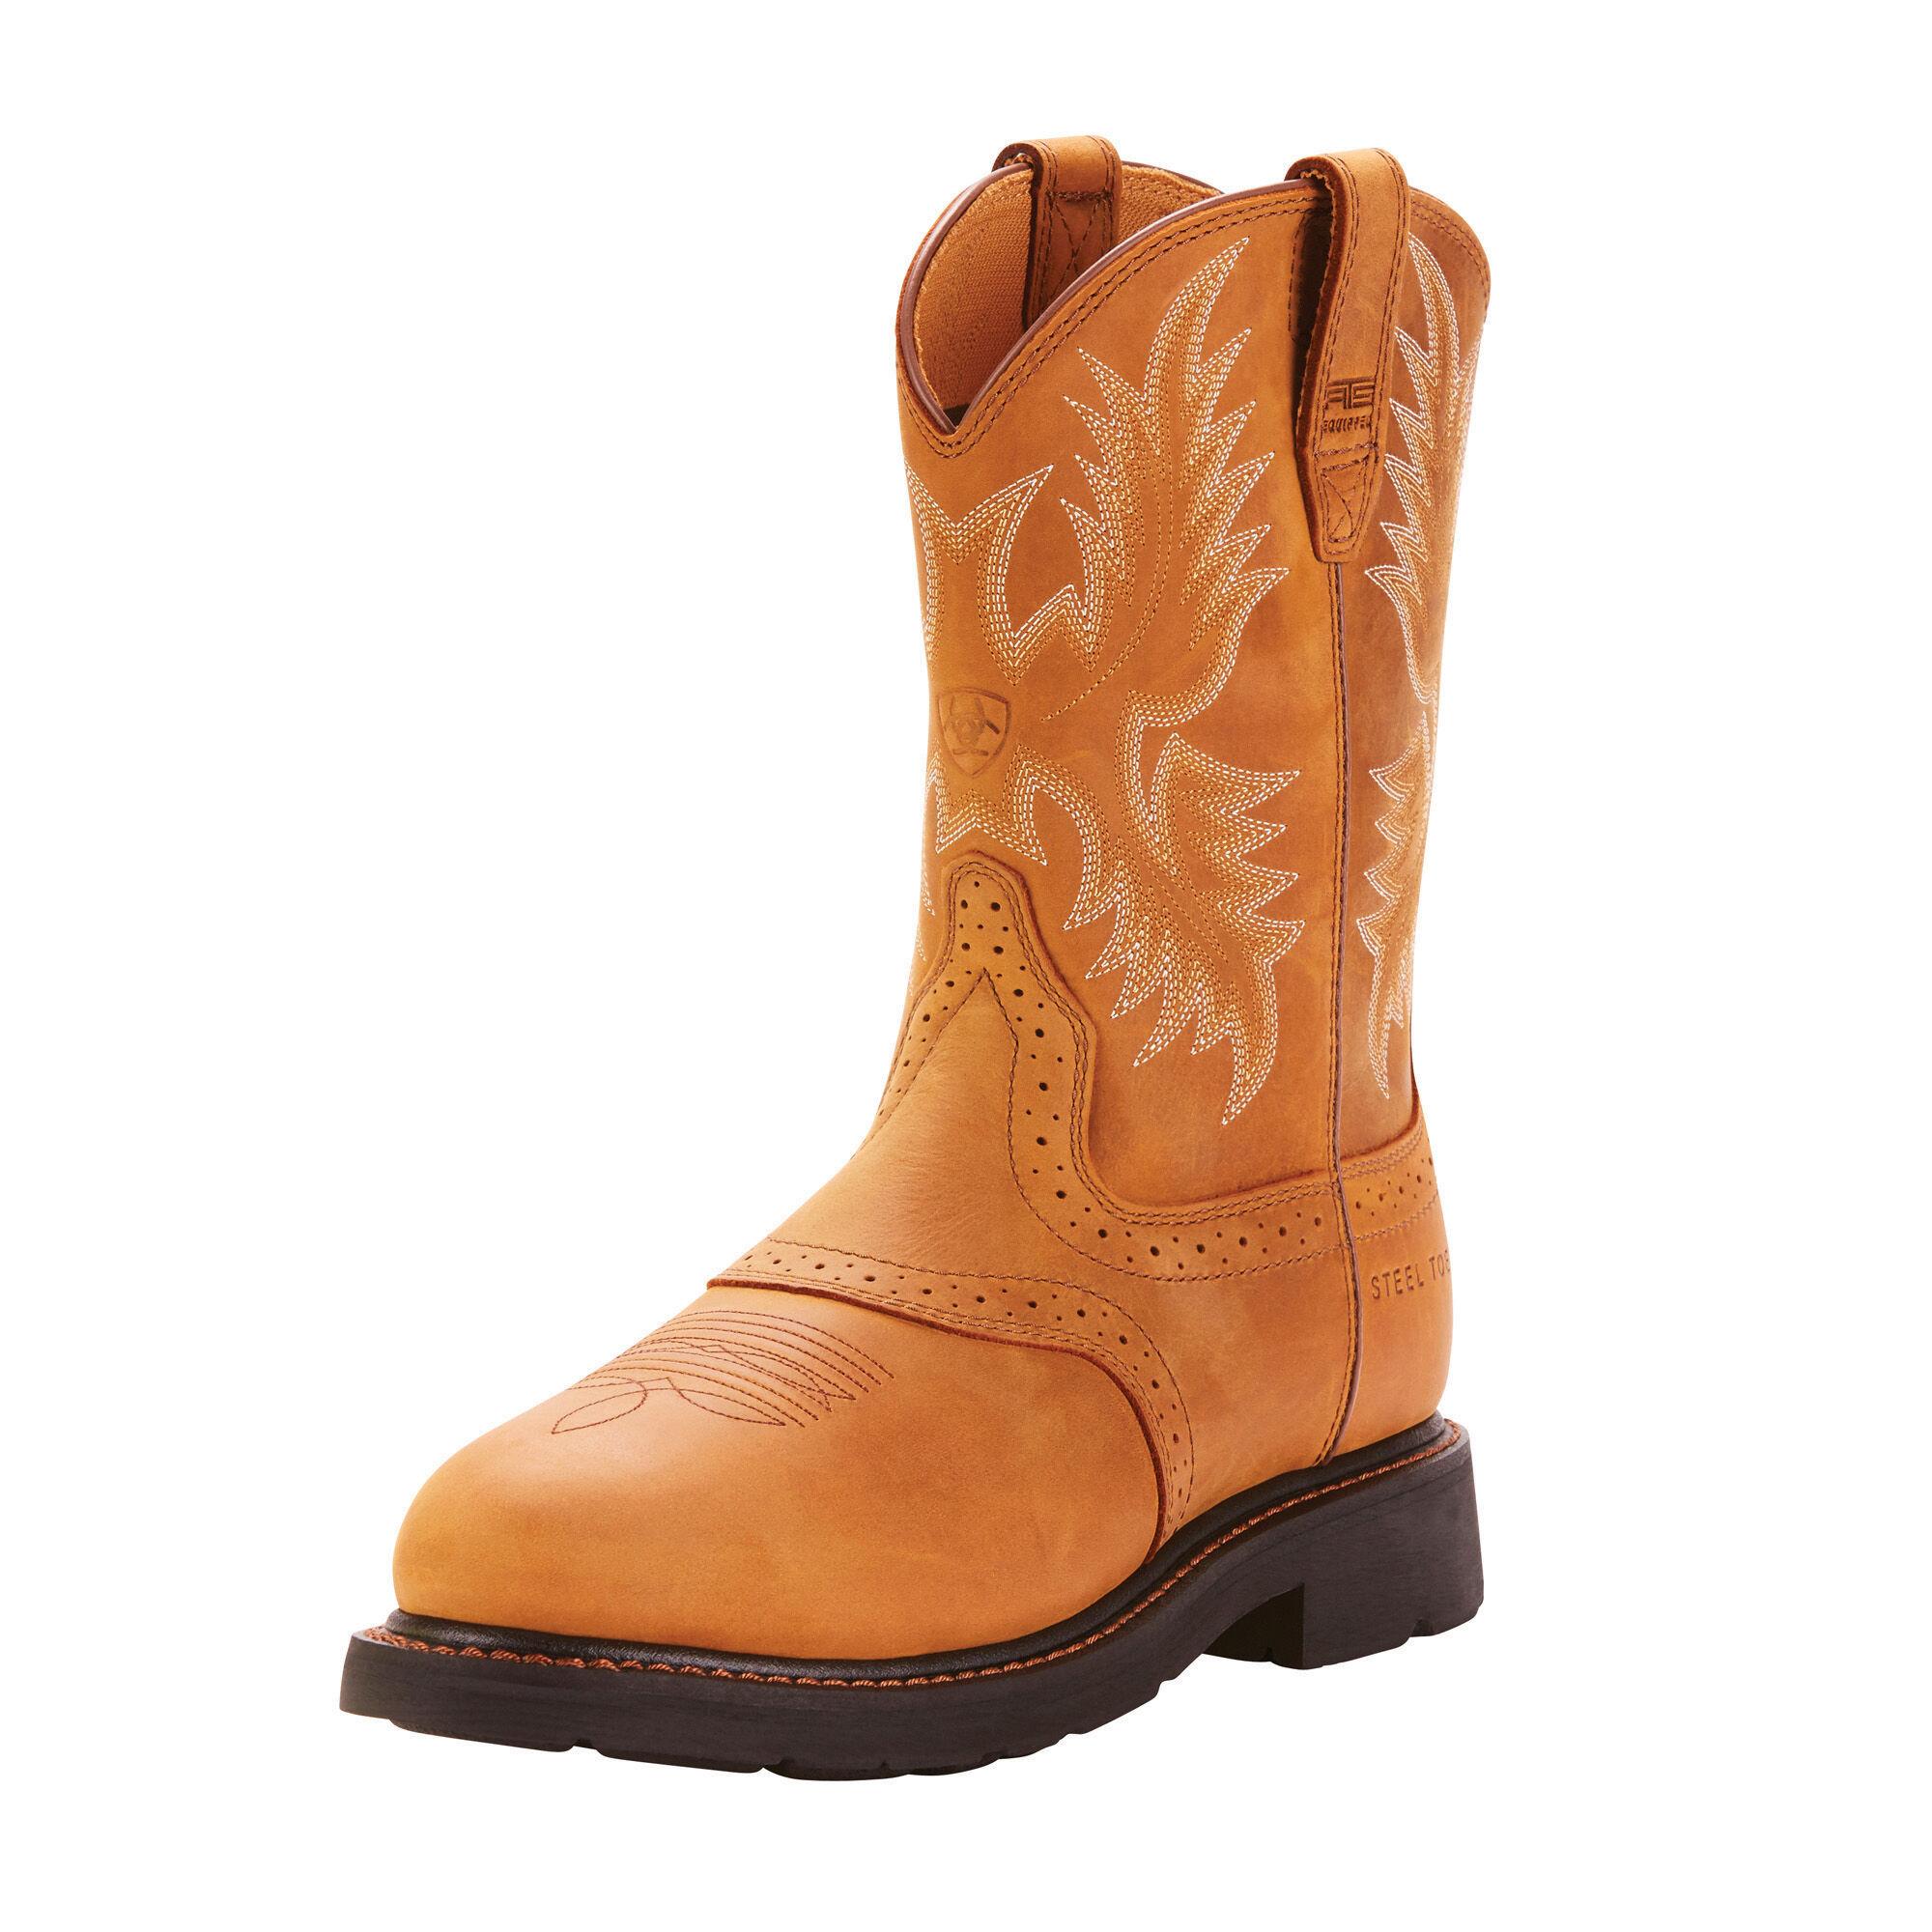 Sierra Saddle Steel Toe Work Boot | Ariat